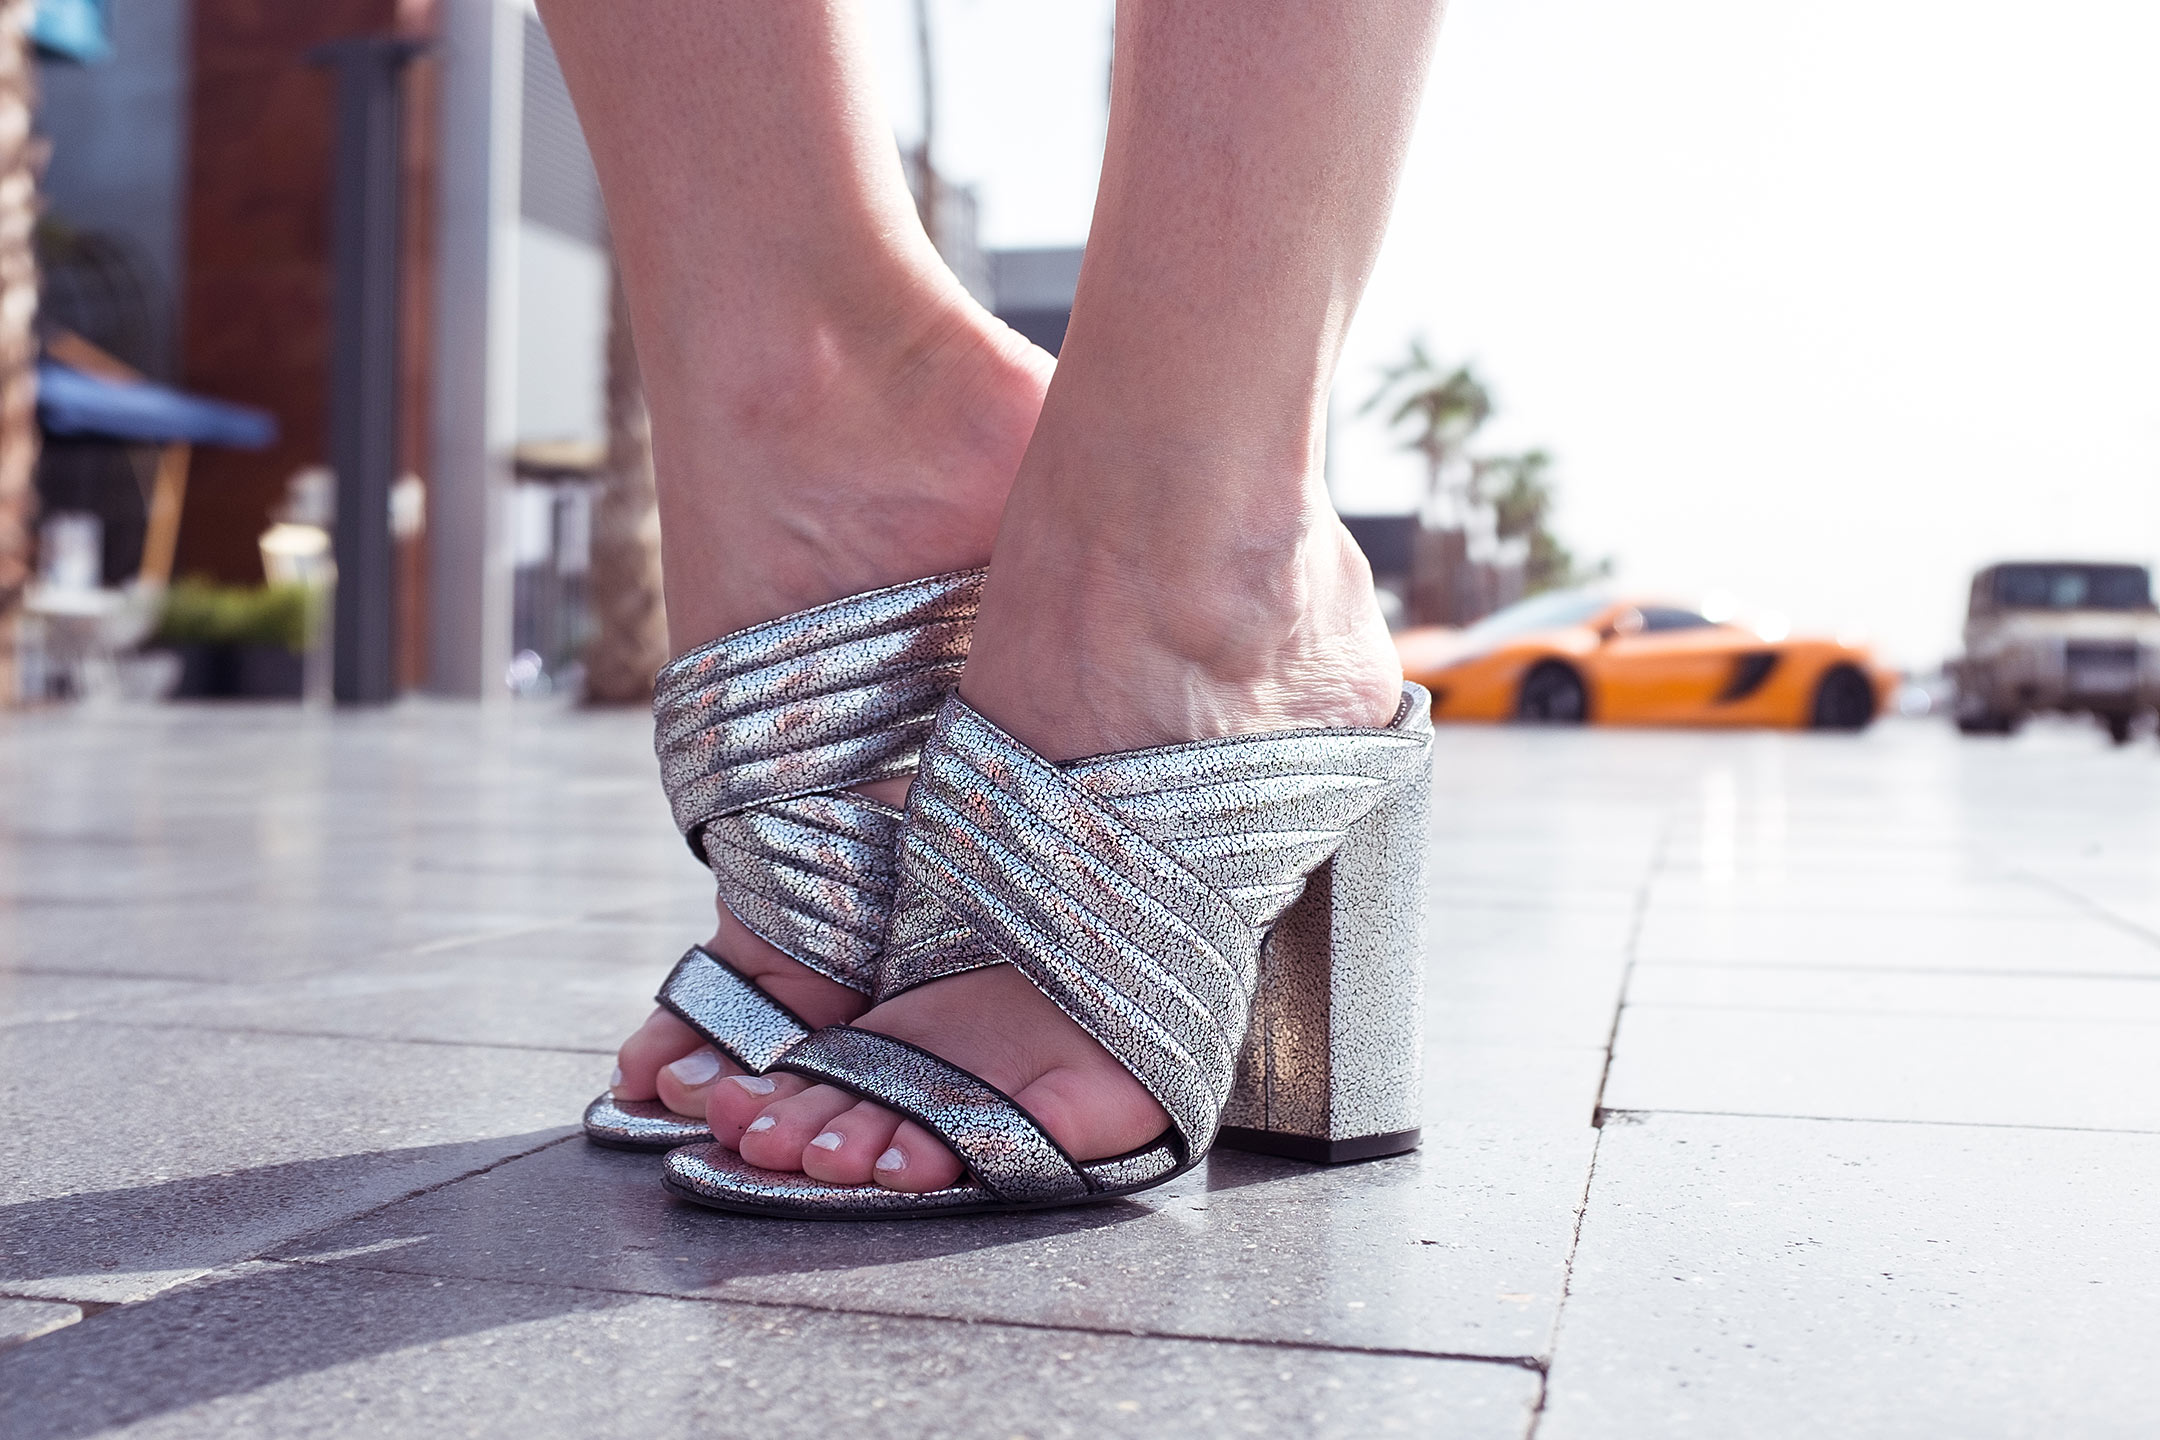 Mules Trendschuhe Sommer Fashionblog Düsseldorf Sunnyinga